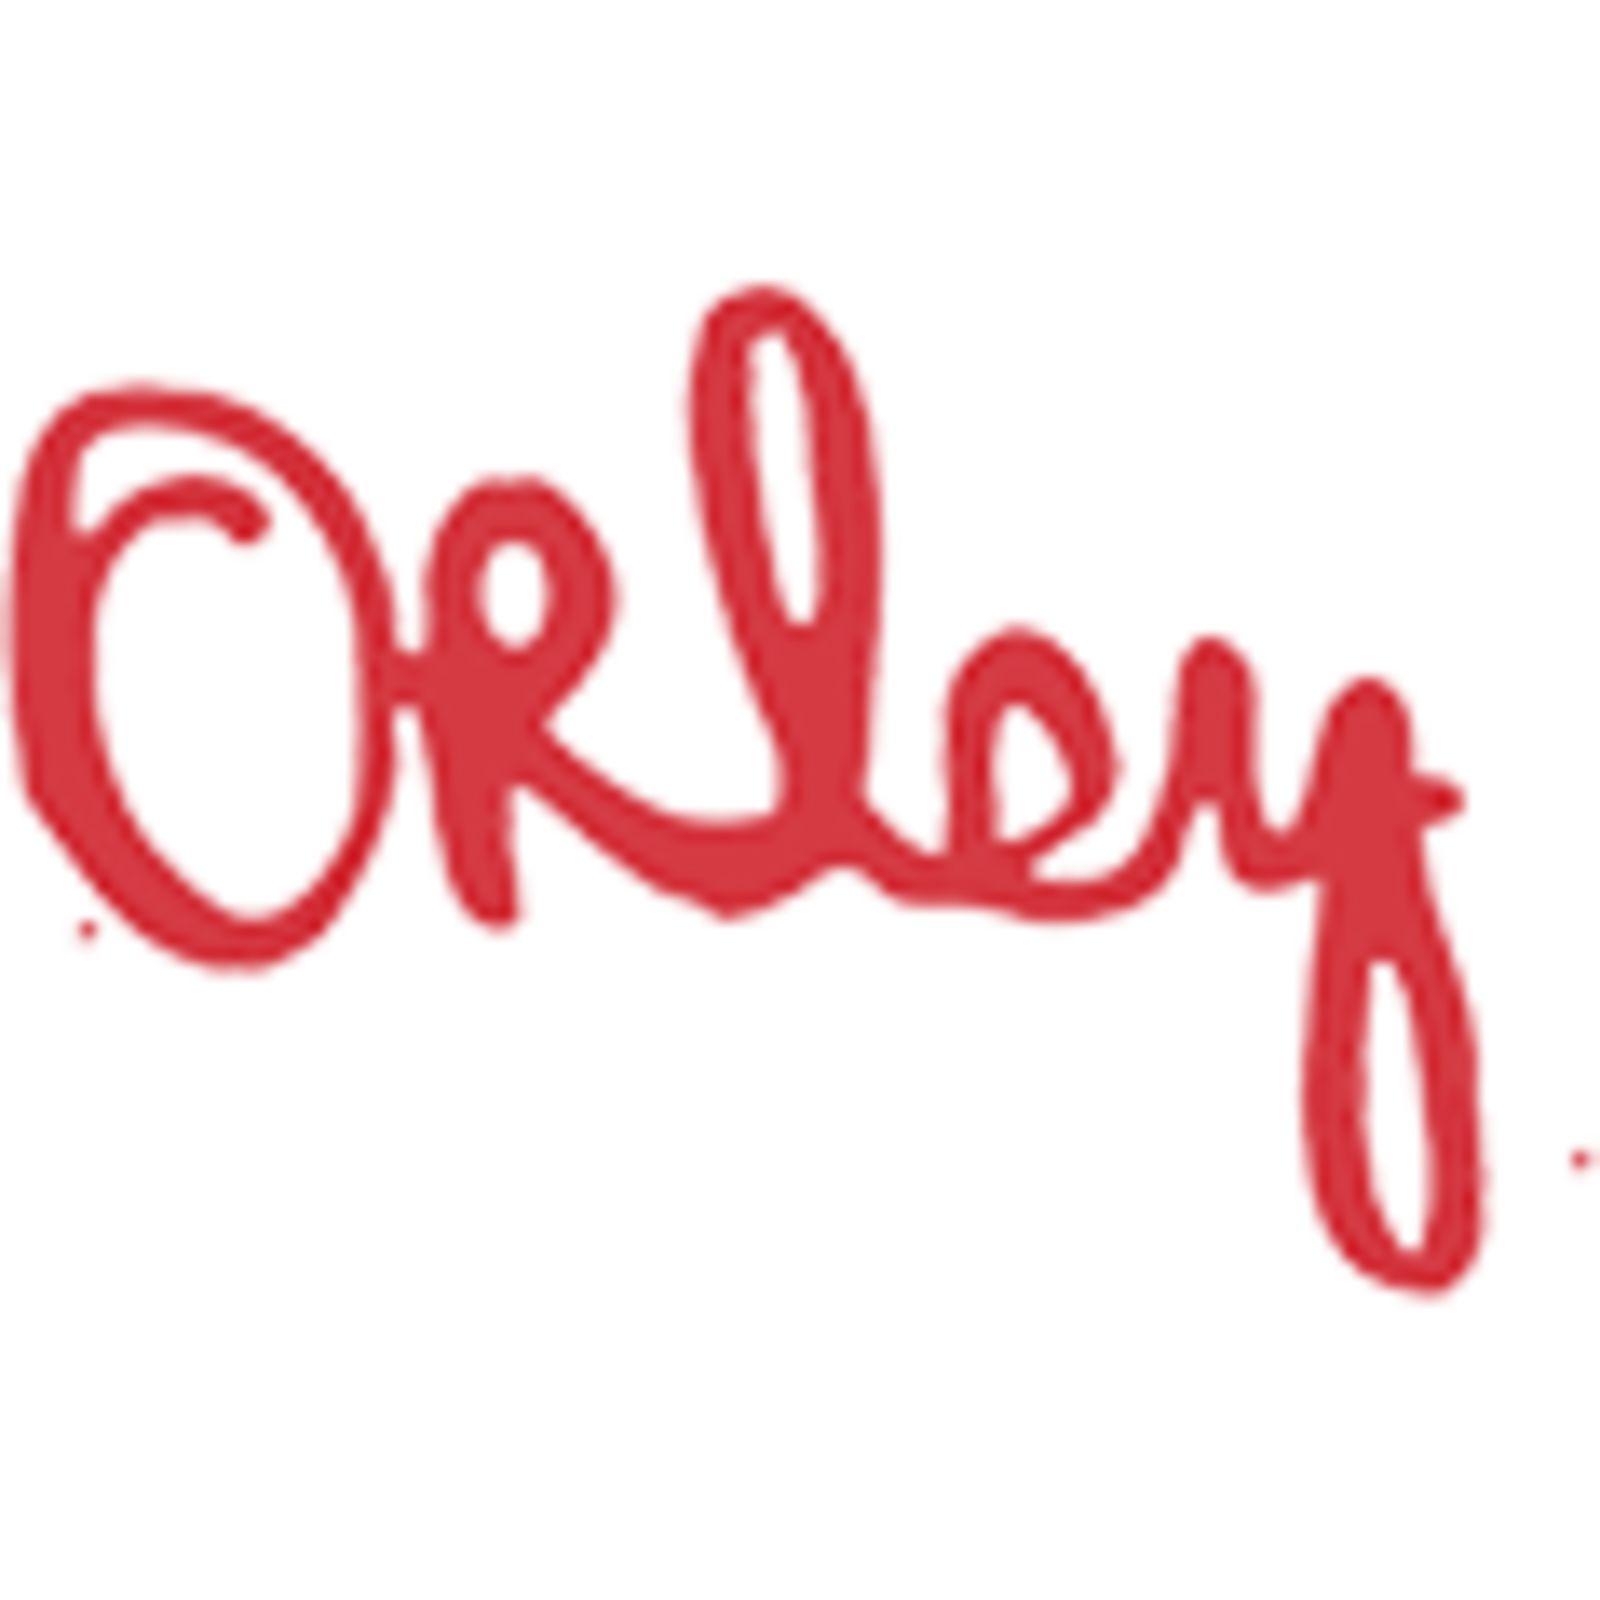 Orley